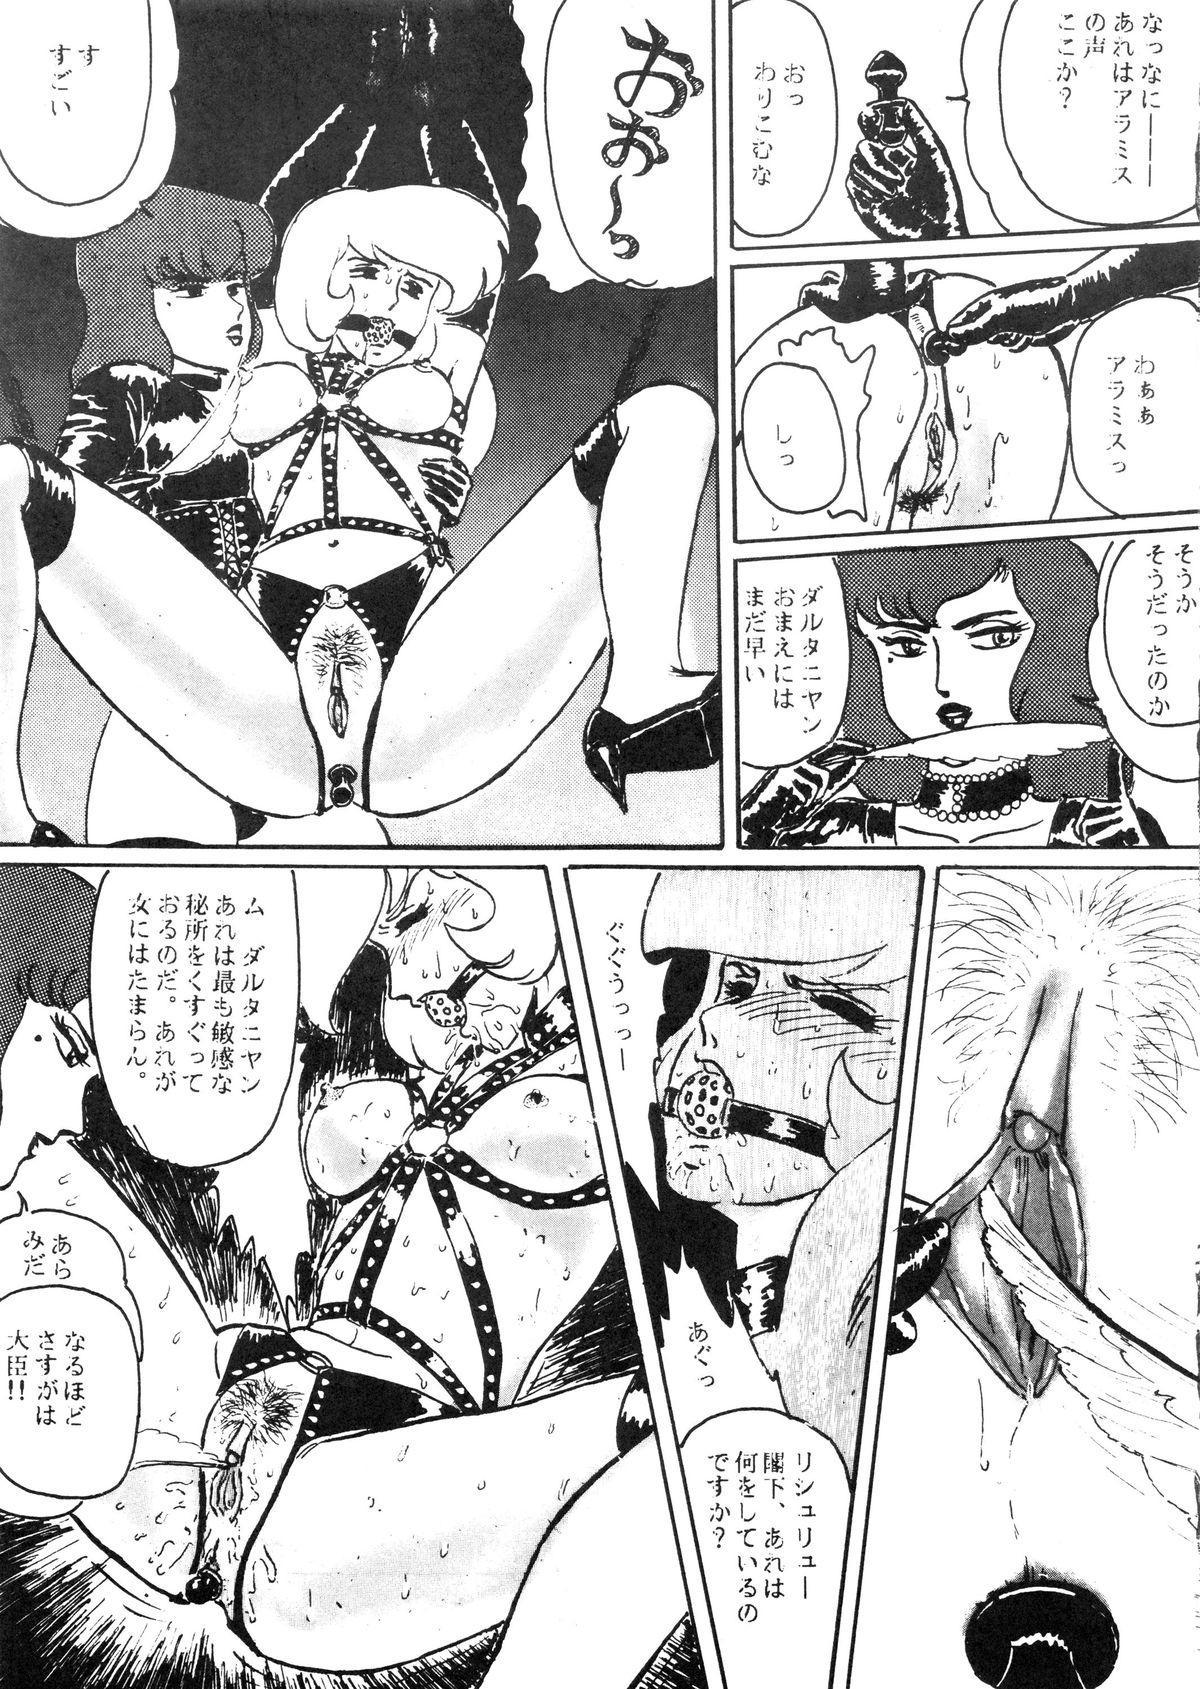 [Secret Society Chi (Iijima Mario)] Kai II - Iijima Mario Kojin-shi - (Various) 27